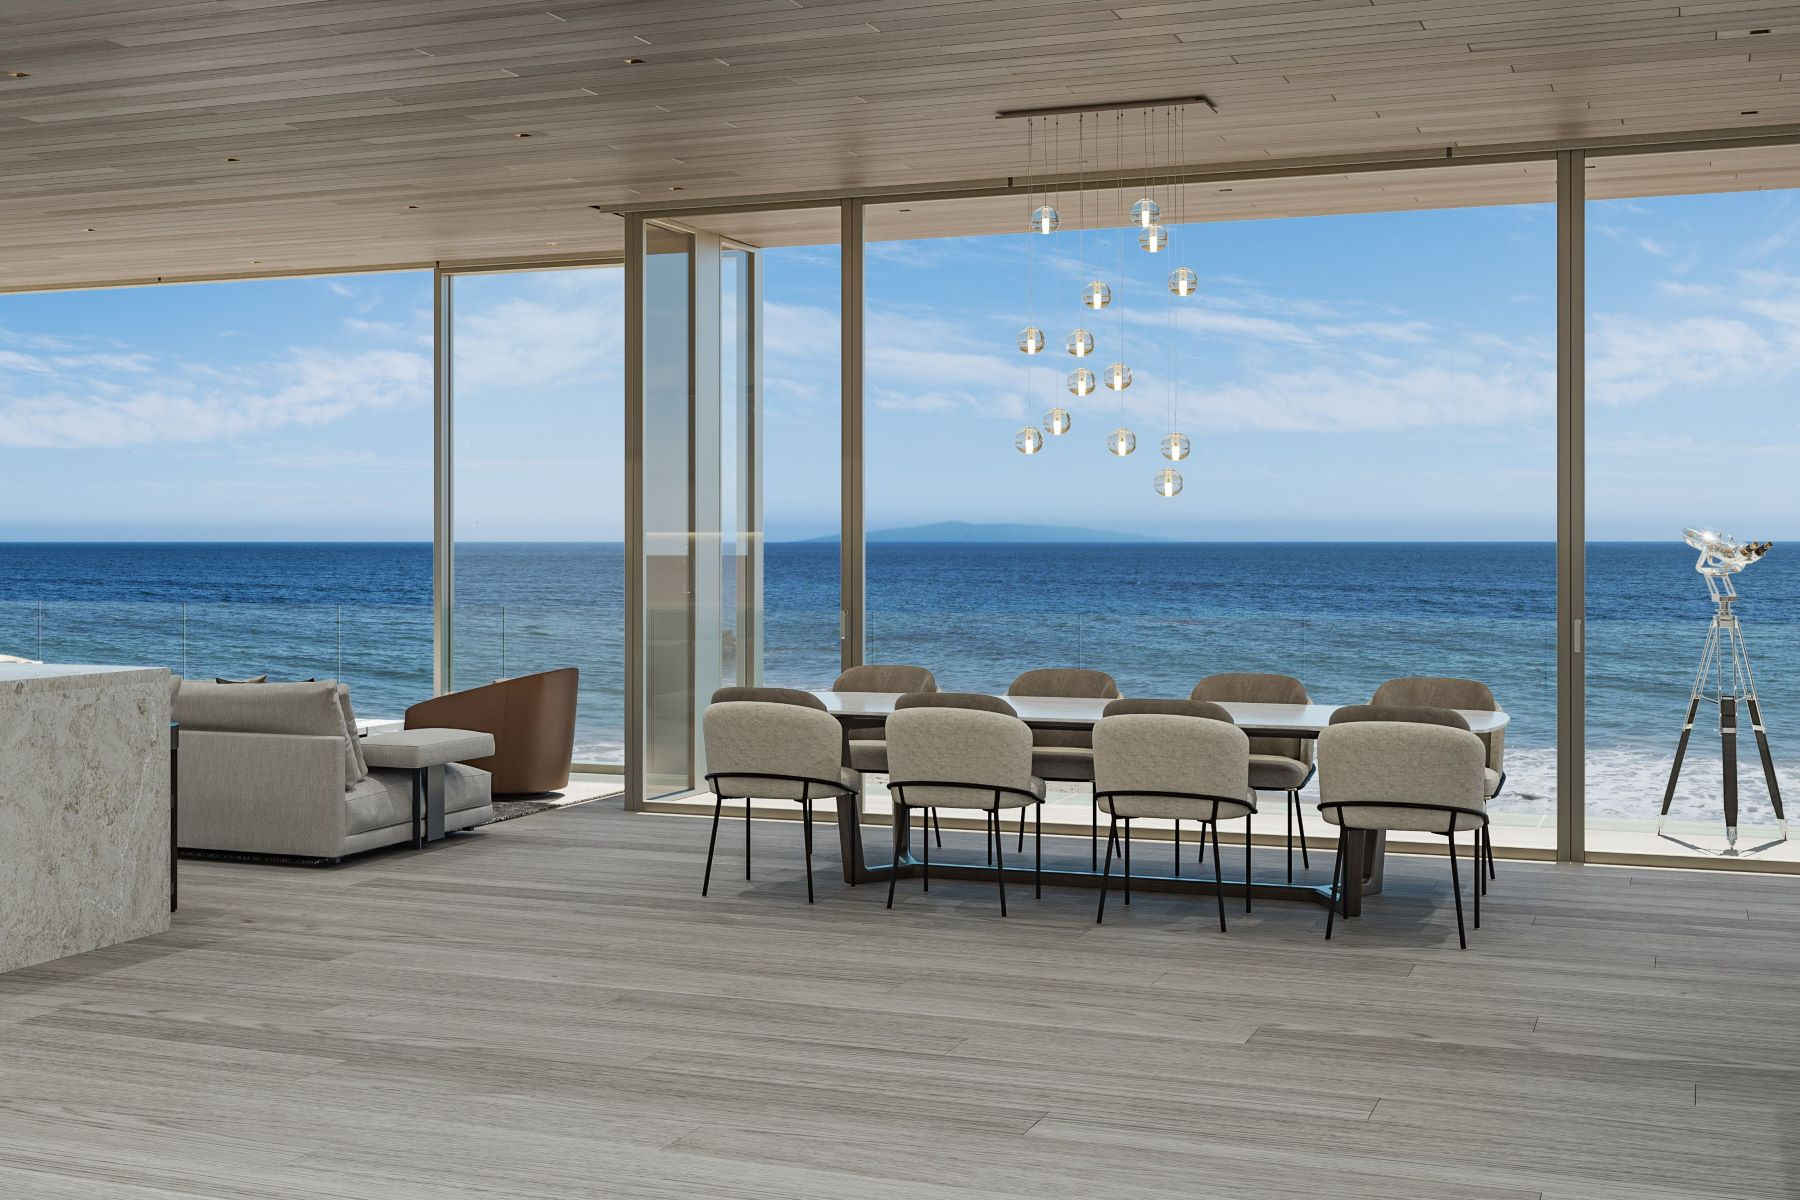 Single Family Homes for Sale at Brand New Malibu Oceanfront 24300 Malibu Road Malibu, California 90265 United States